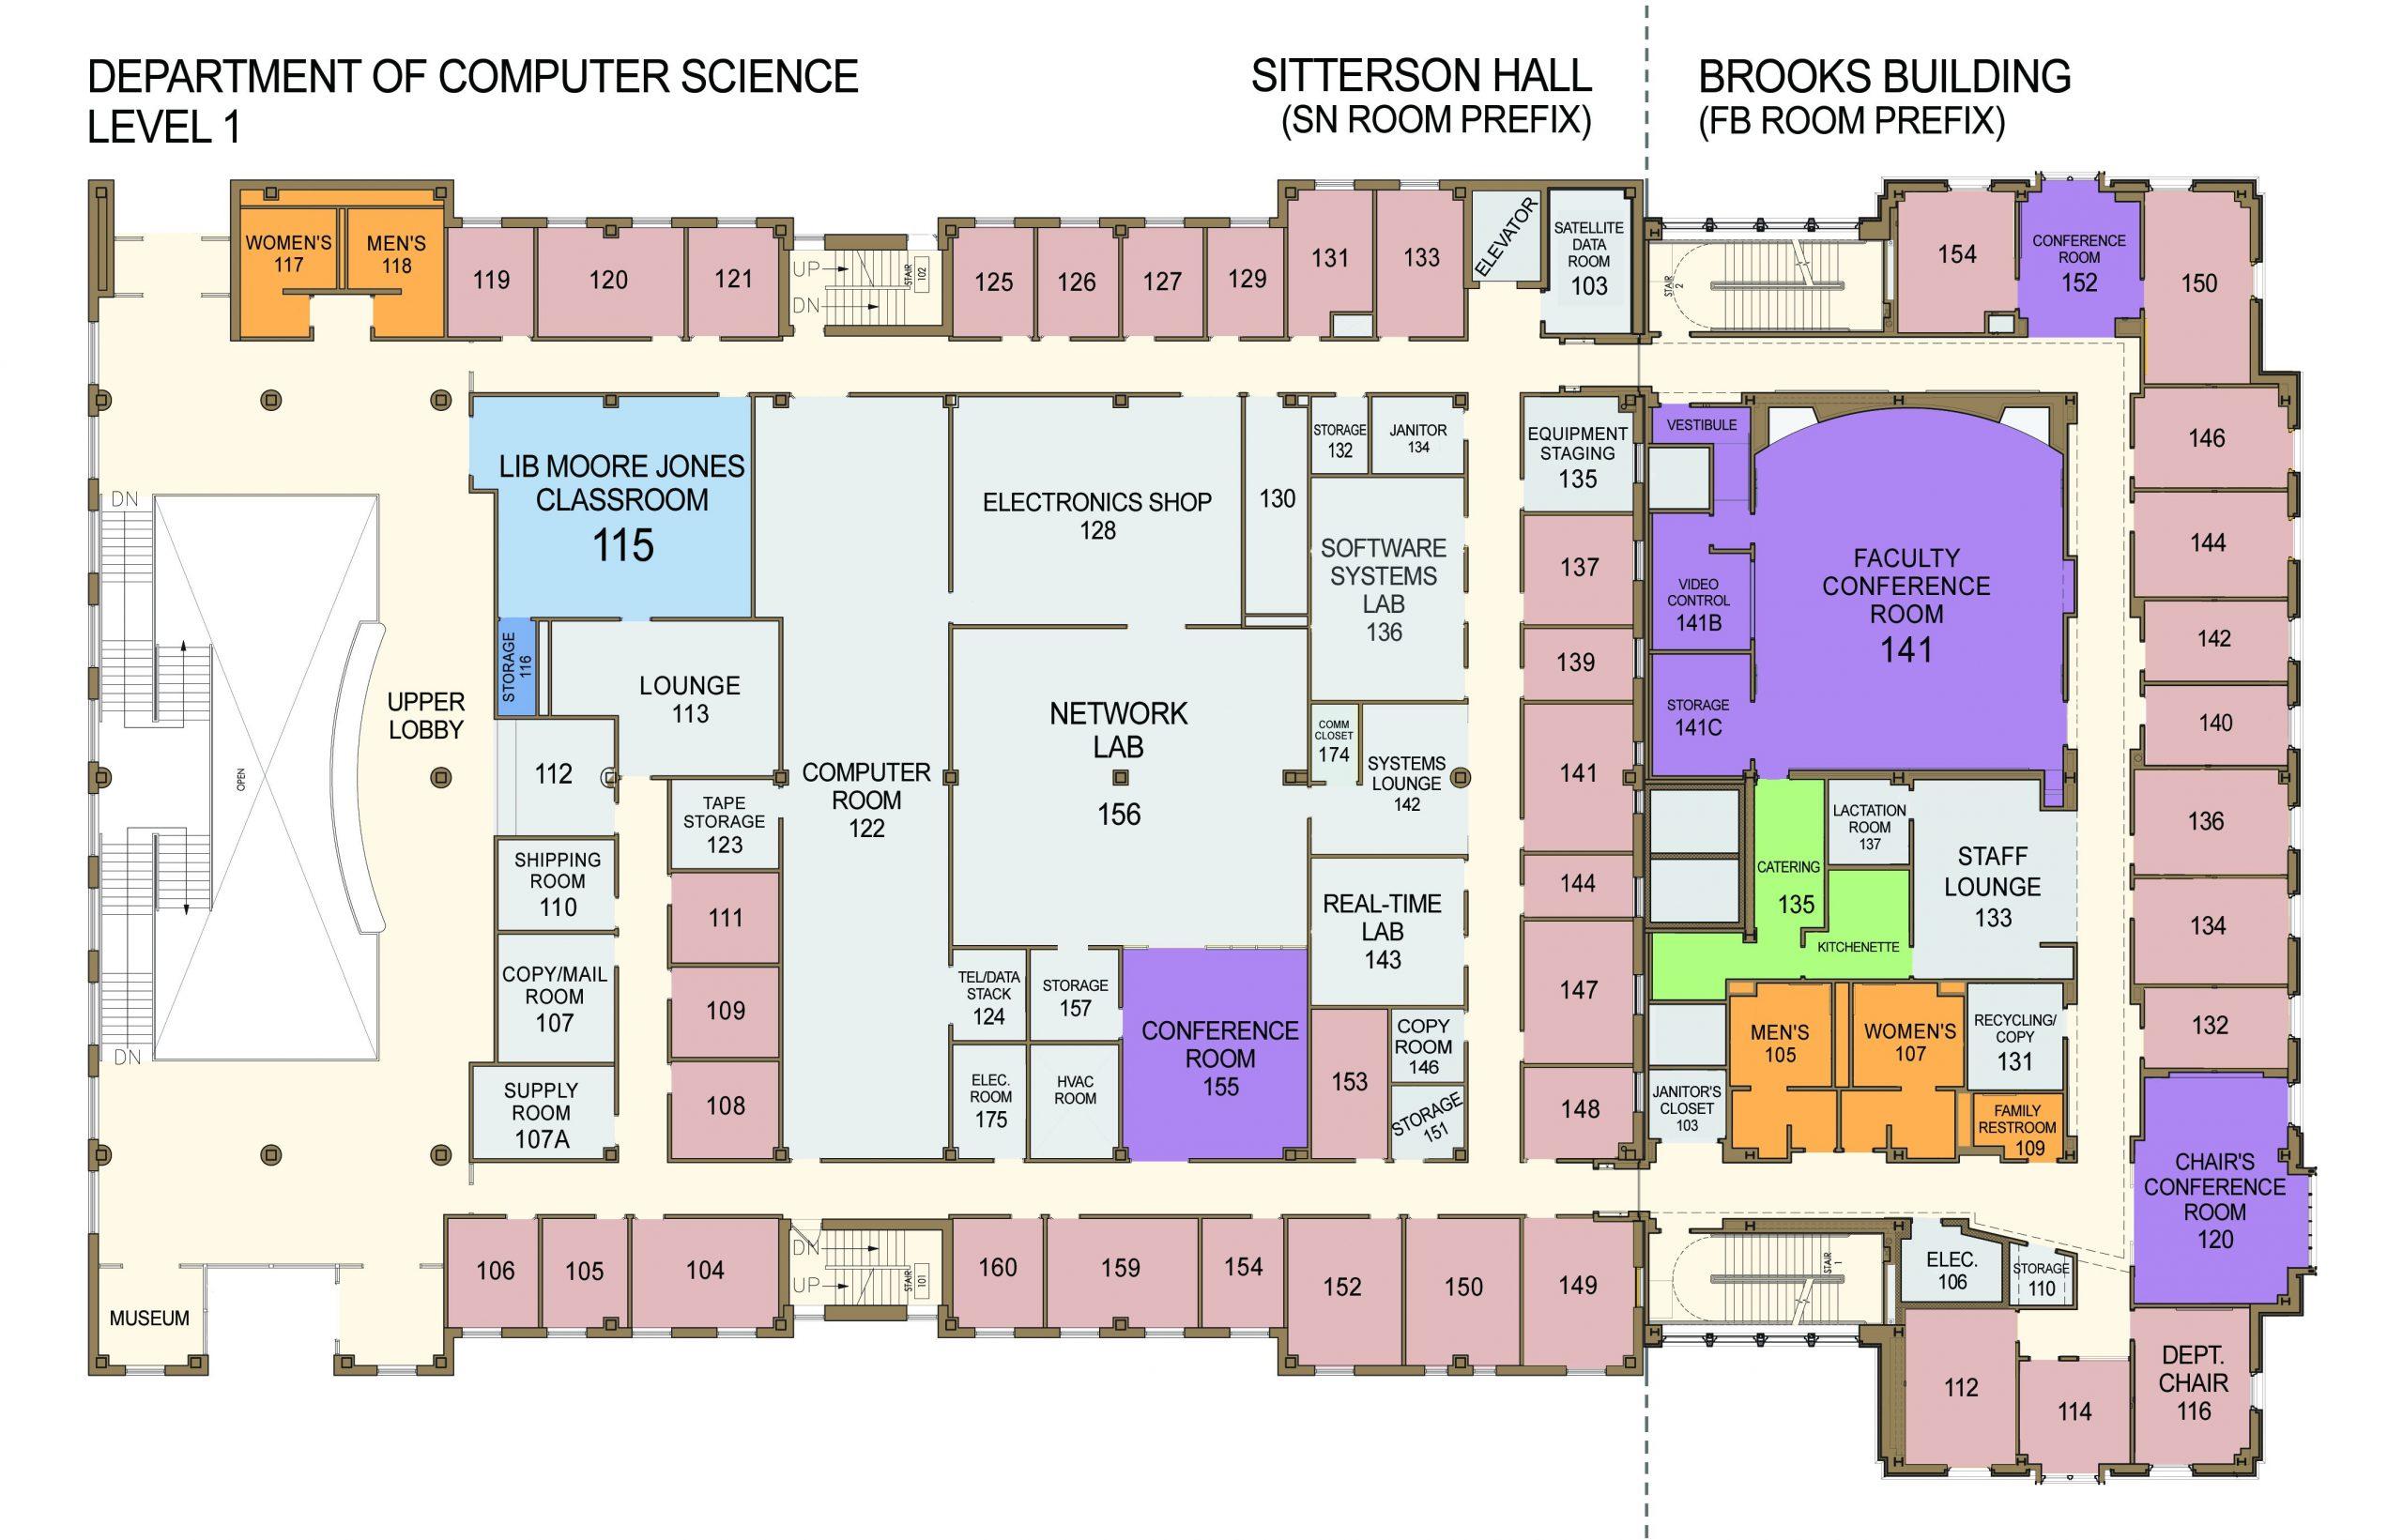 Level 1, Sitterson Hall & Brooks Bldg